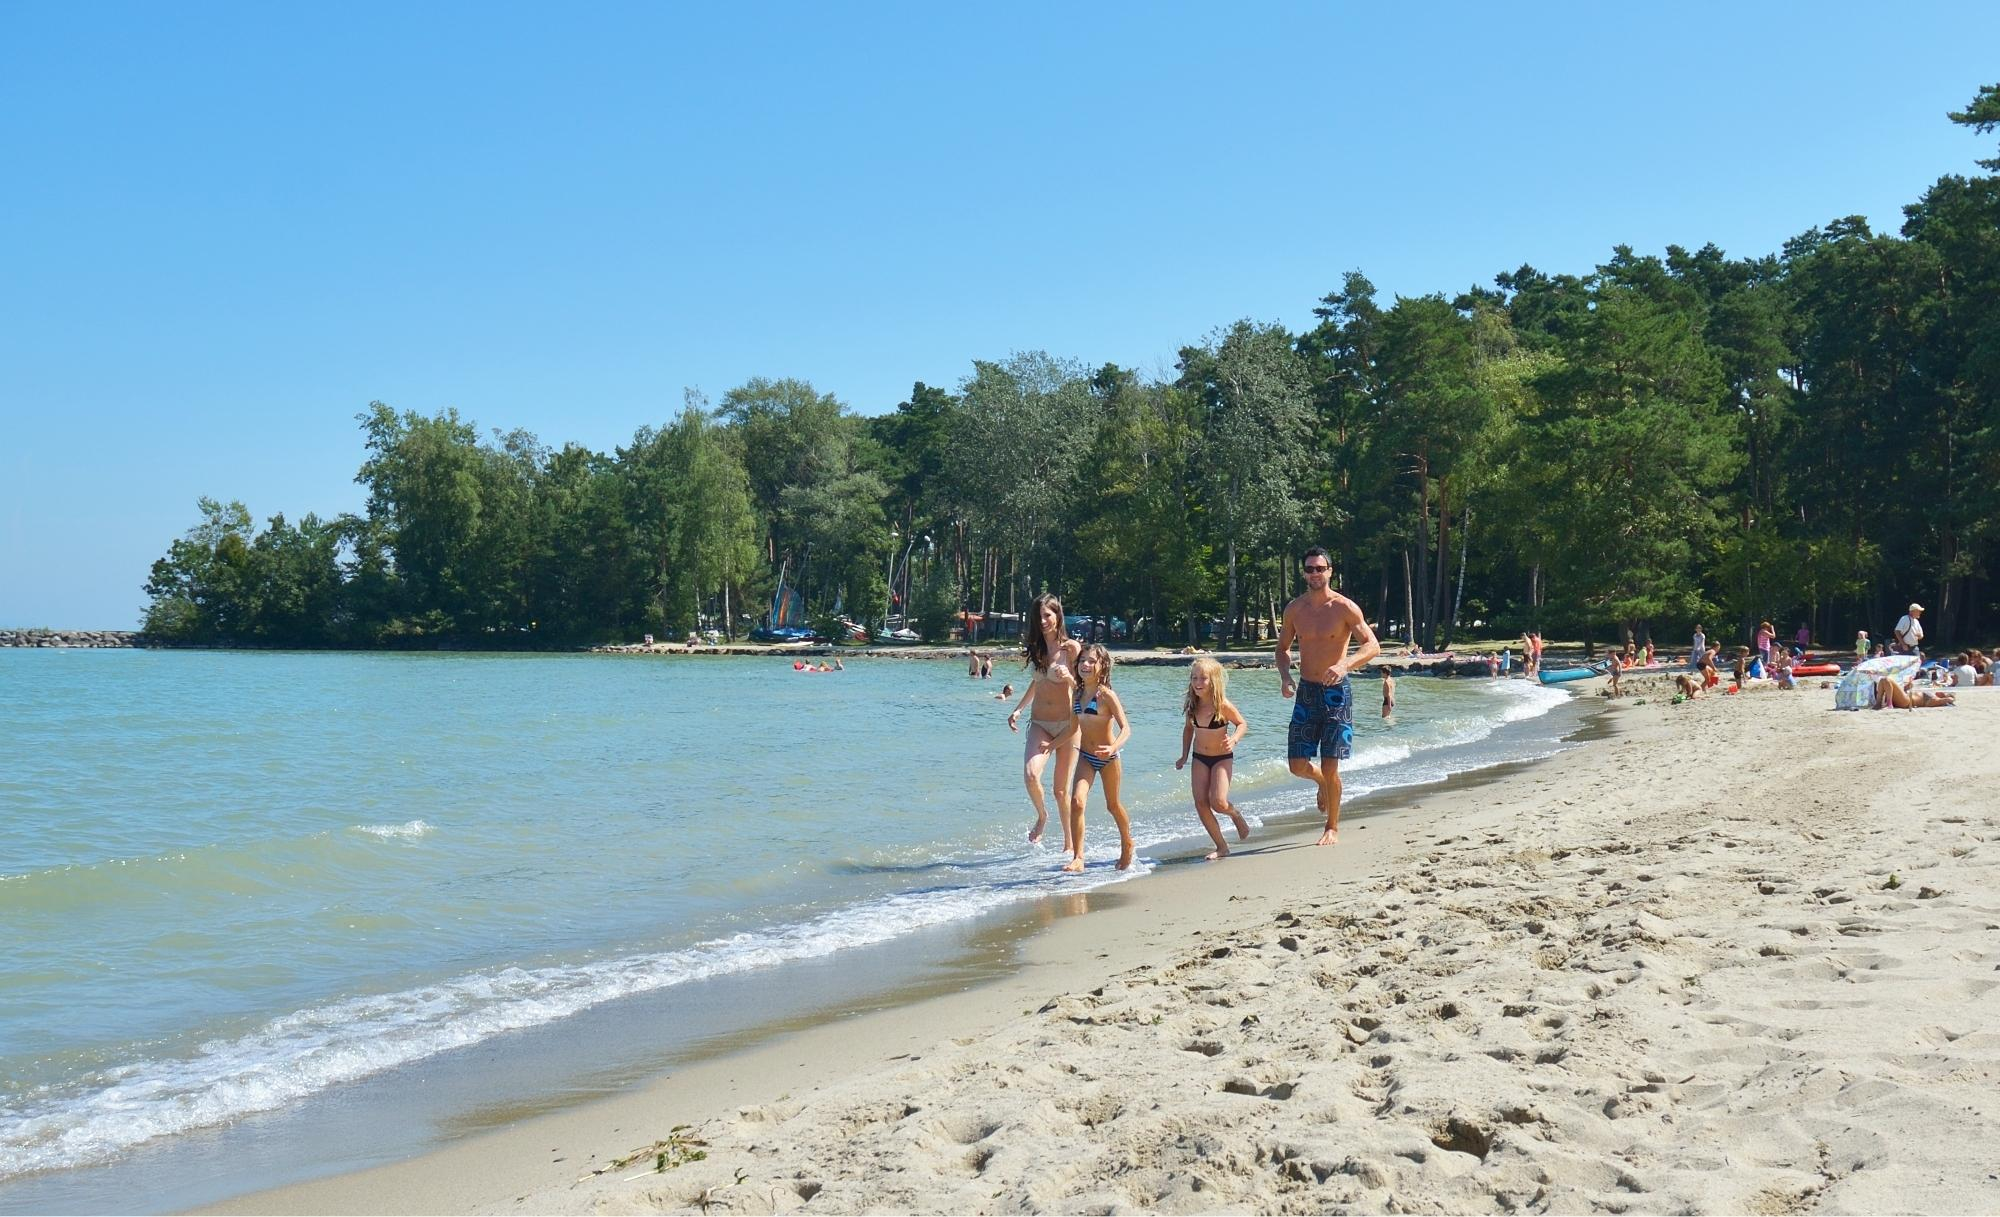 Yvonand yverdon les bains region jura lac suisse for Piscine yverdon